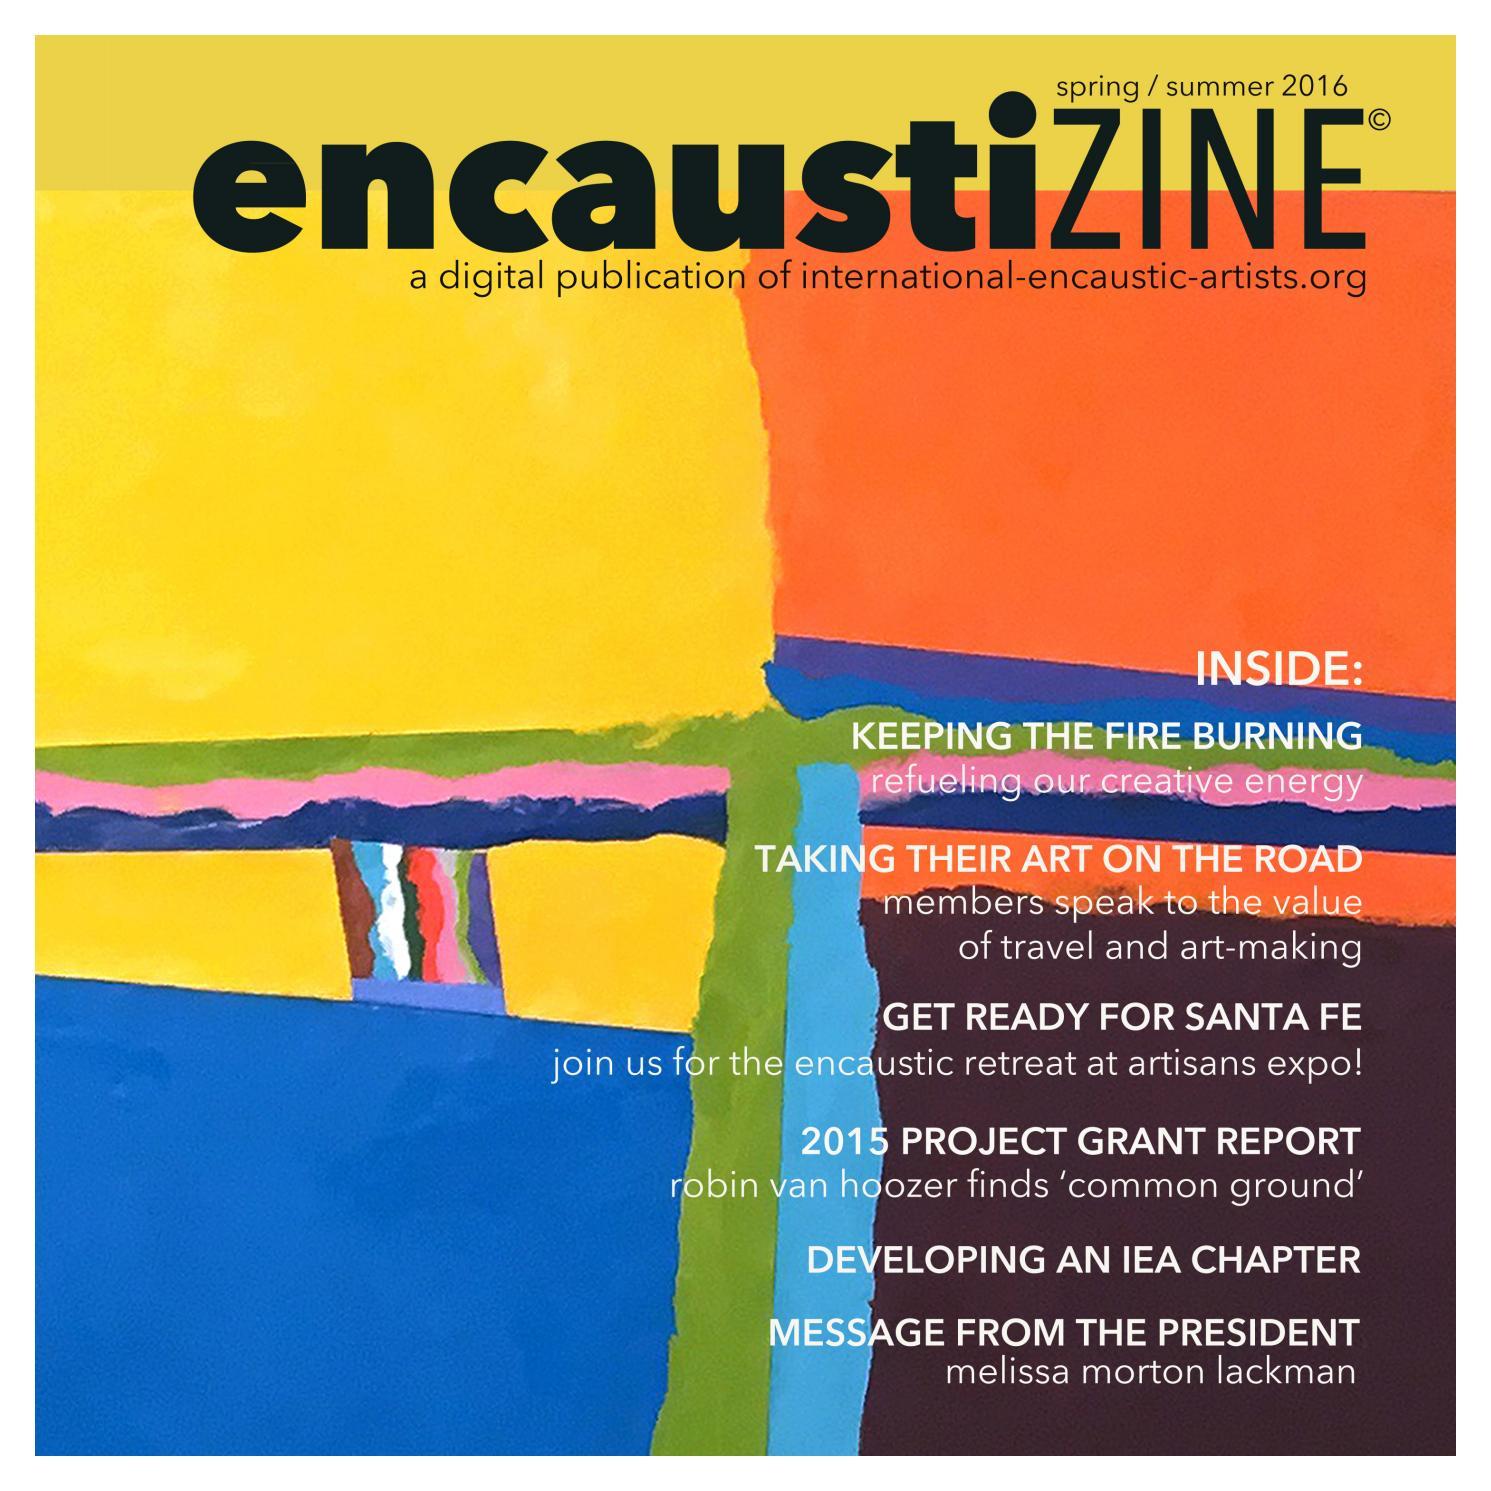 Encaustic: a selection of sites